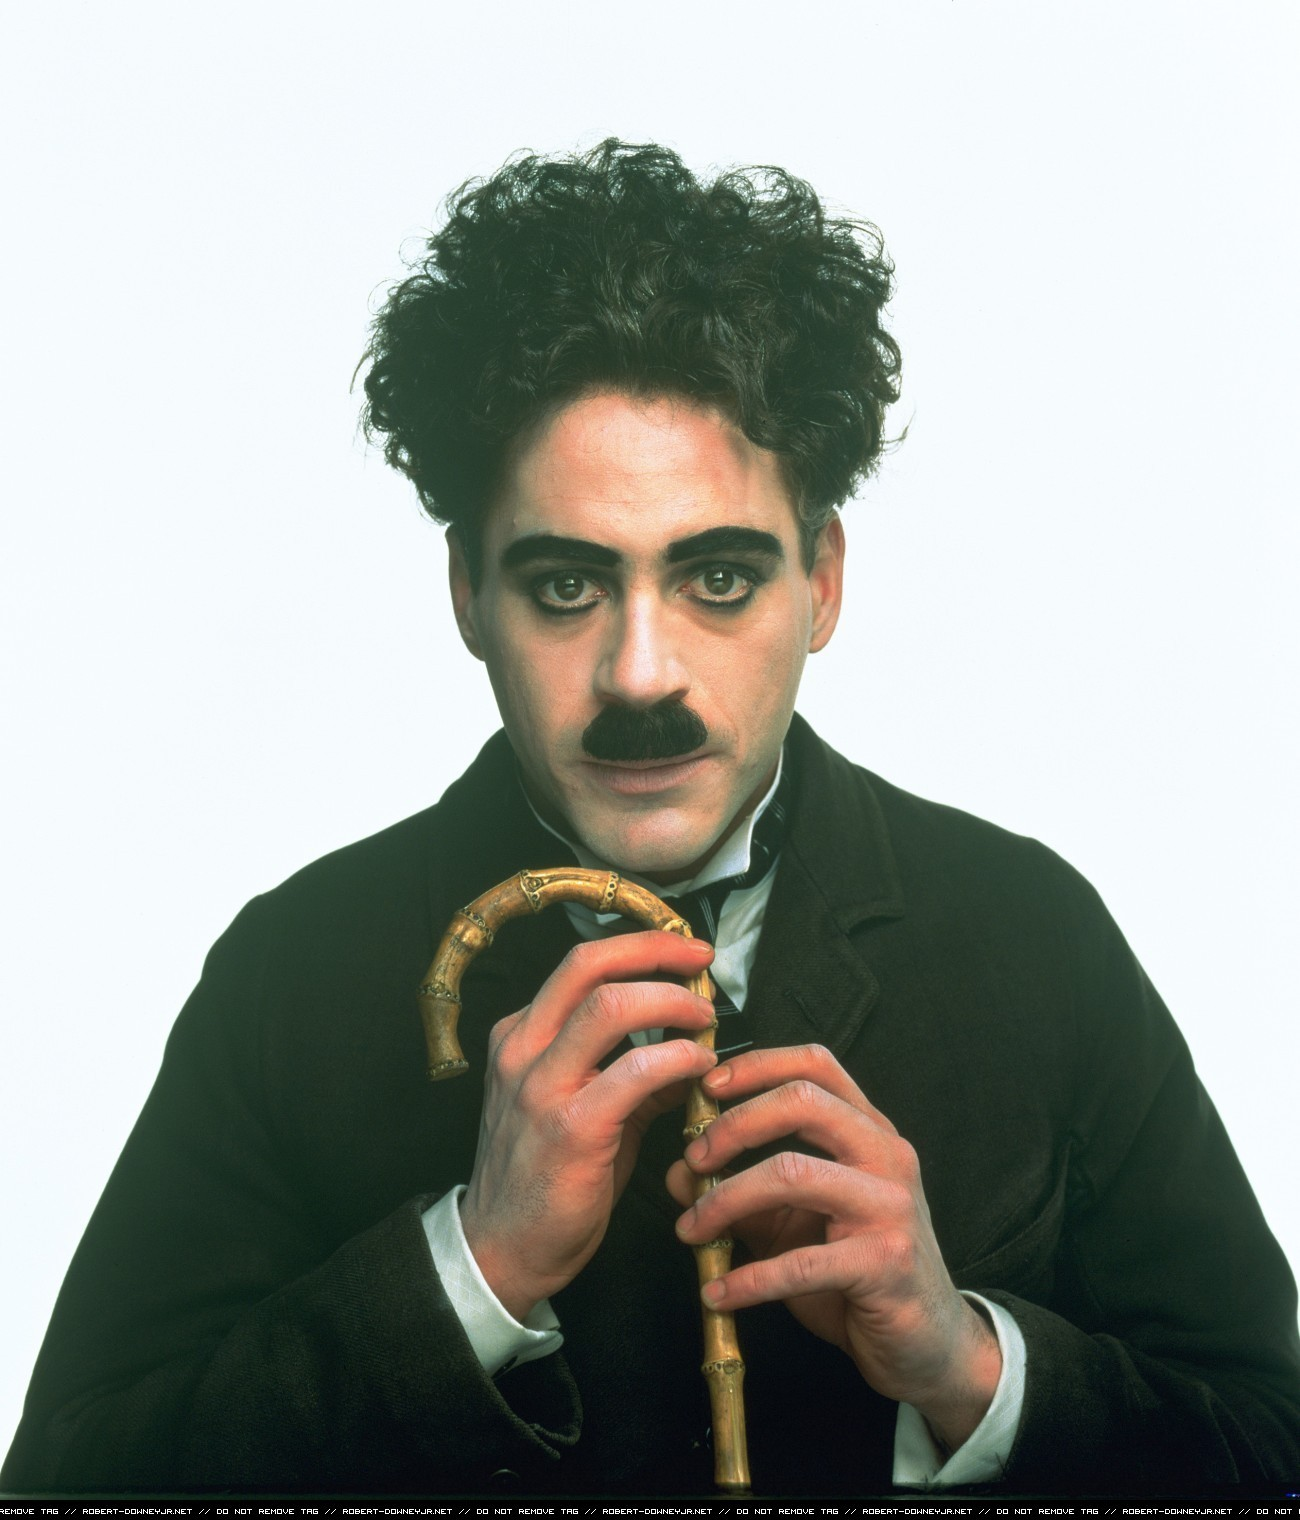 http://3.bp.blogspot.com/-jjczLZR5vBg/T5jrRpLIGRI/AAAAAAAABWg/NXl34SLwAqw/s1600/Chaplin-robert-downey-jr-15352769-1300-1520.jpg